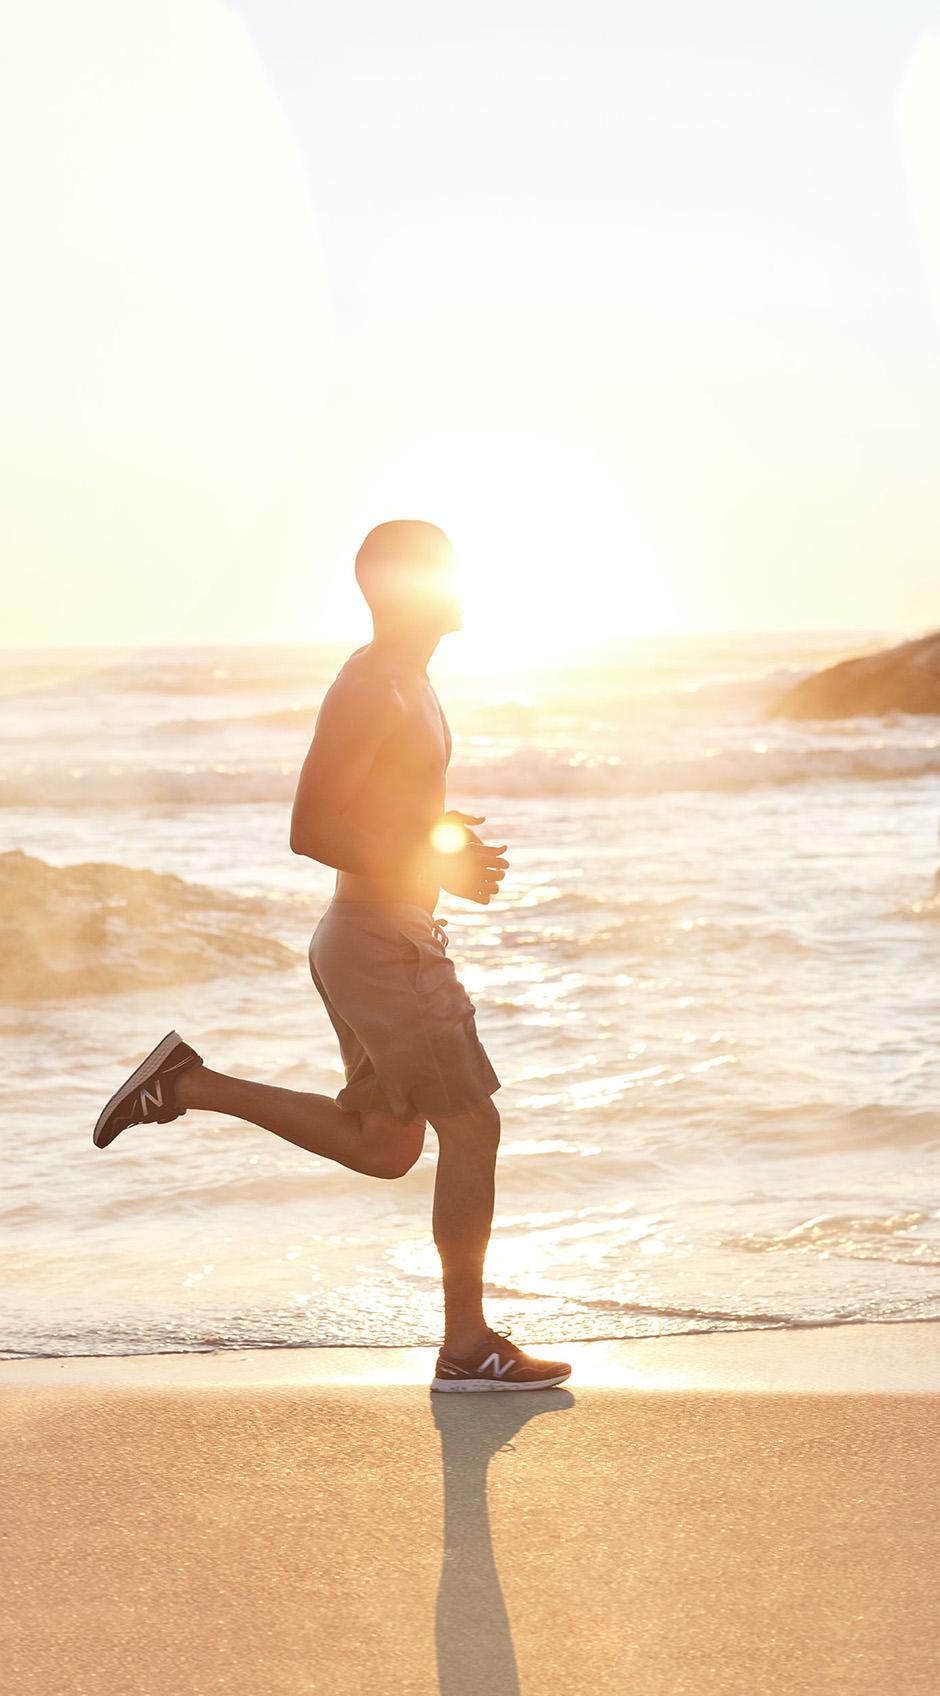 160413_Westin_DAY2_Beach_Run_340_RGB_LOW